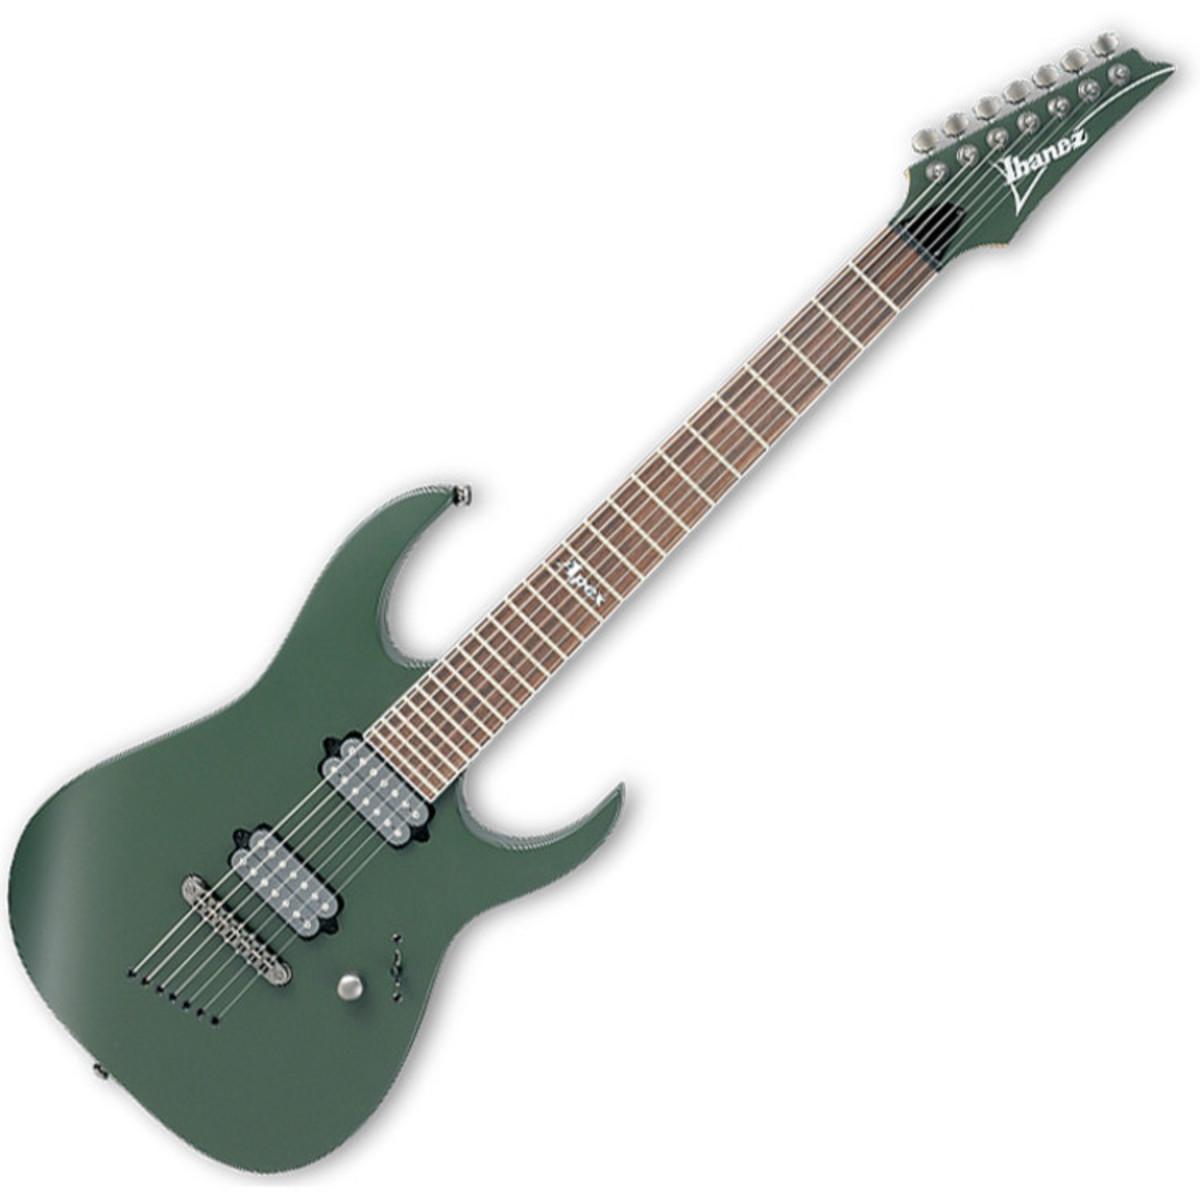 disc ibanez apex2 korn 7 string electric guitar green shadow flat at gear4music. Black Bedroom Furniture Sets. Home Design Ideas